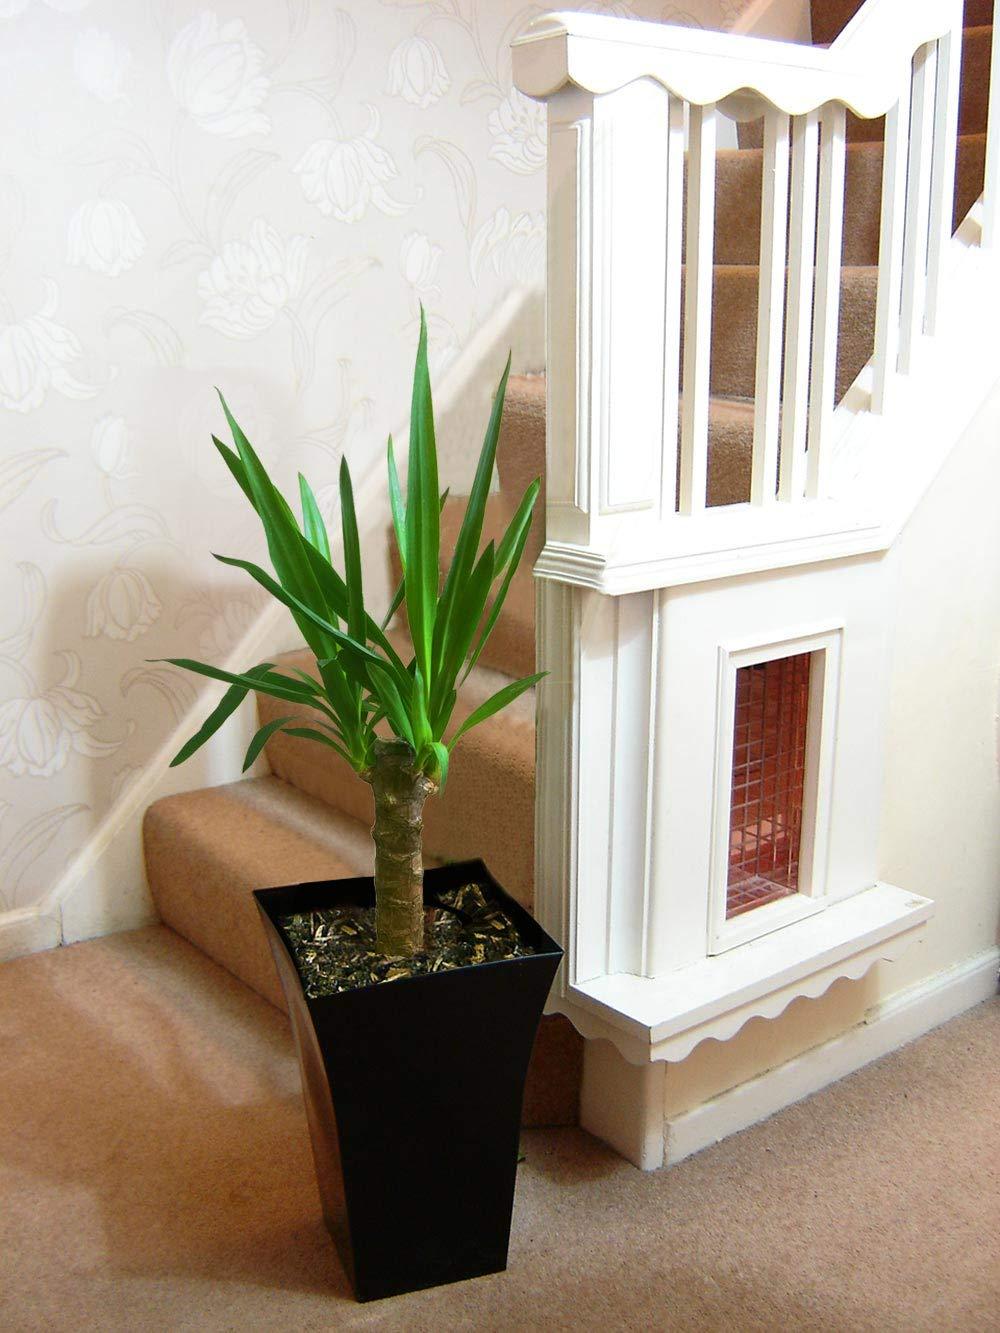 1 Evergreen Aloe Vera Natural House Indoor Office Plant Gloss White Milano Pot